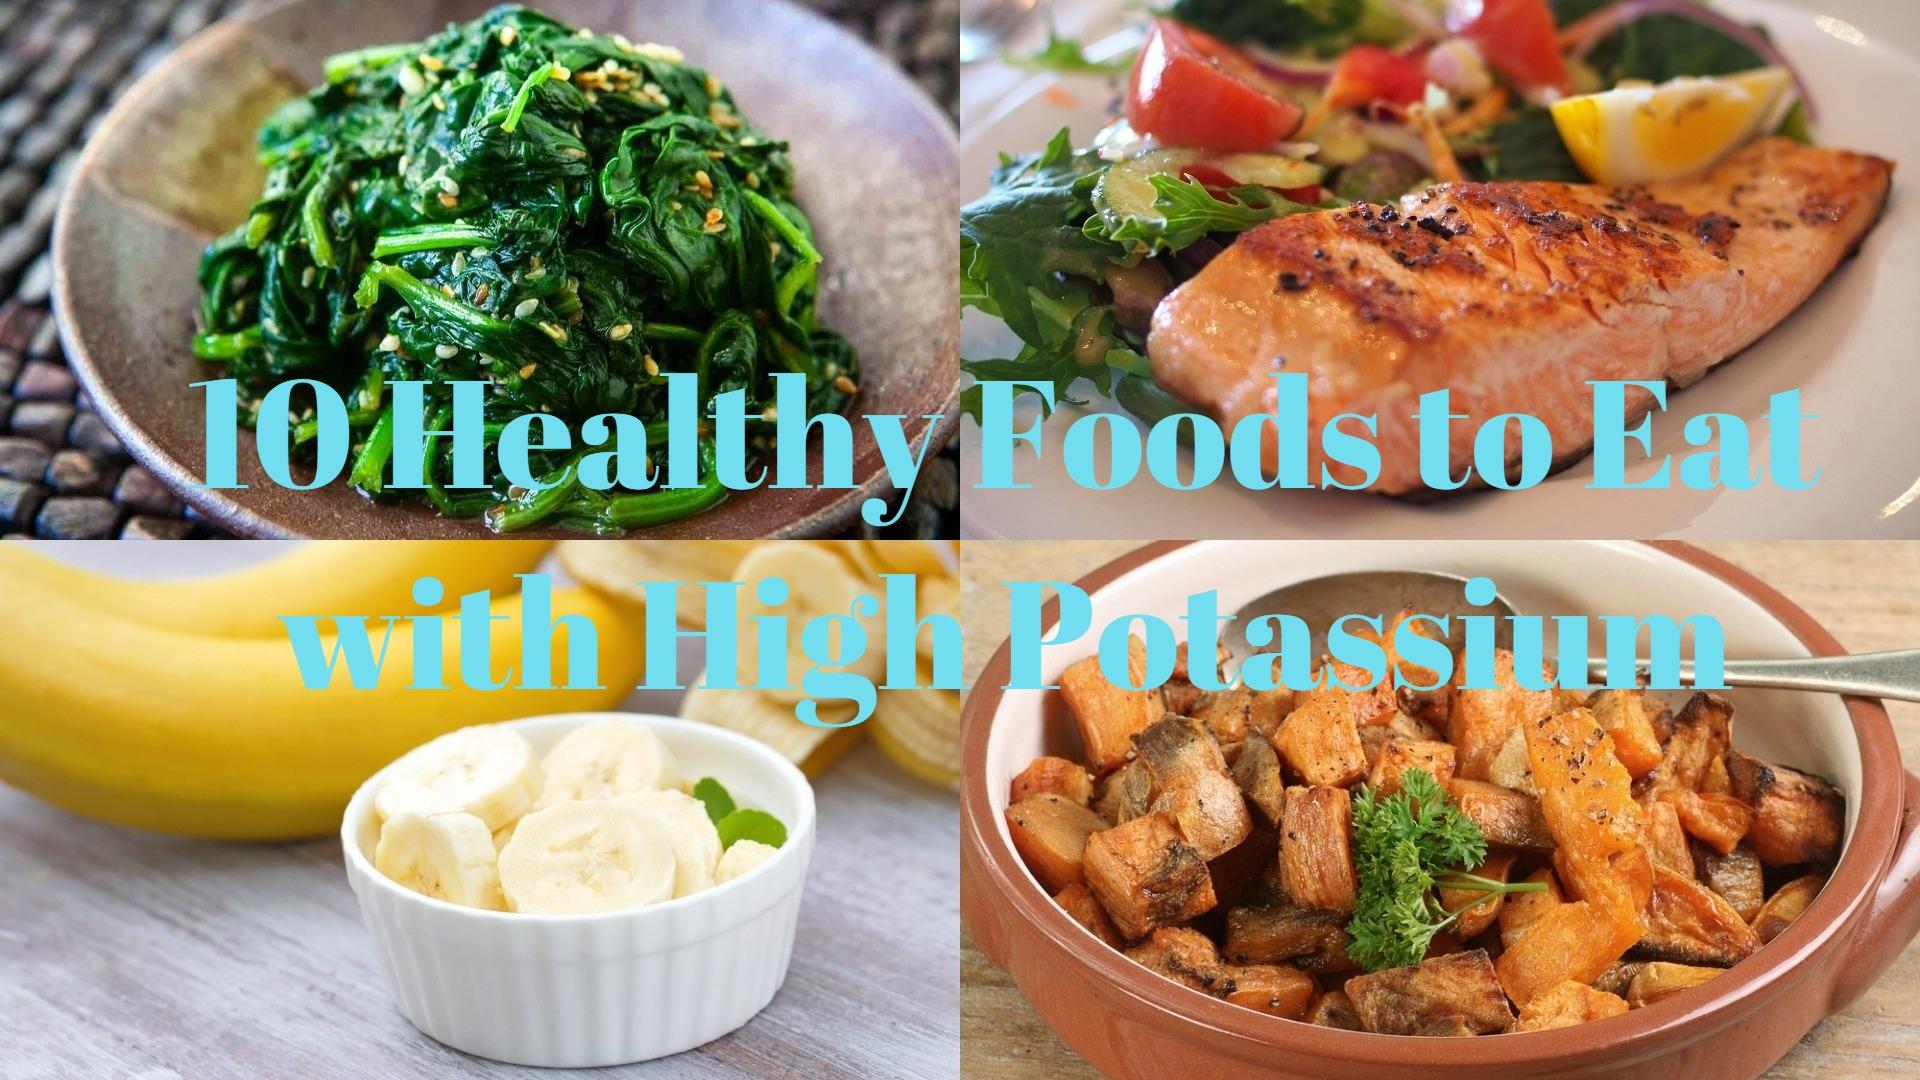 Foods with High Potassium